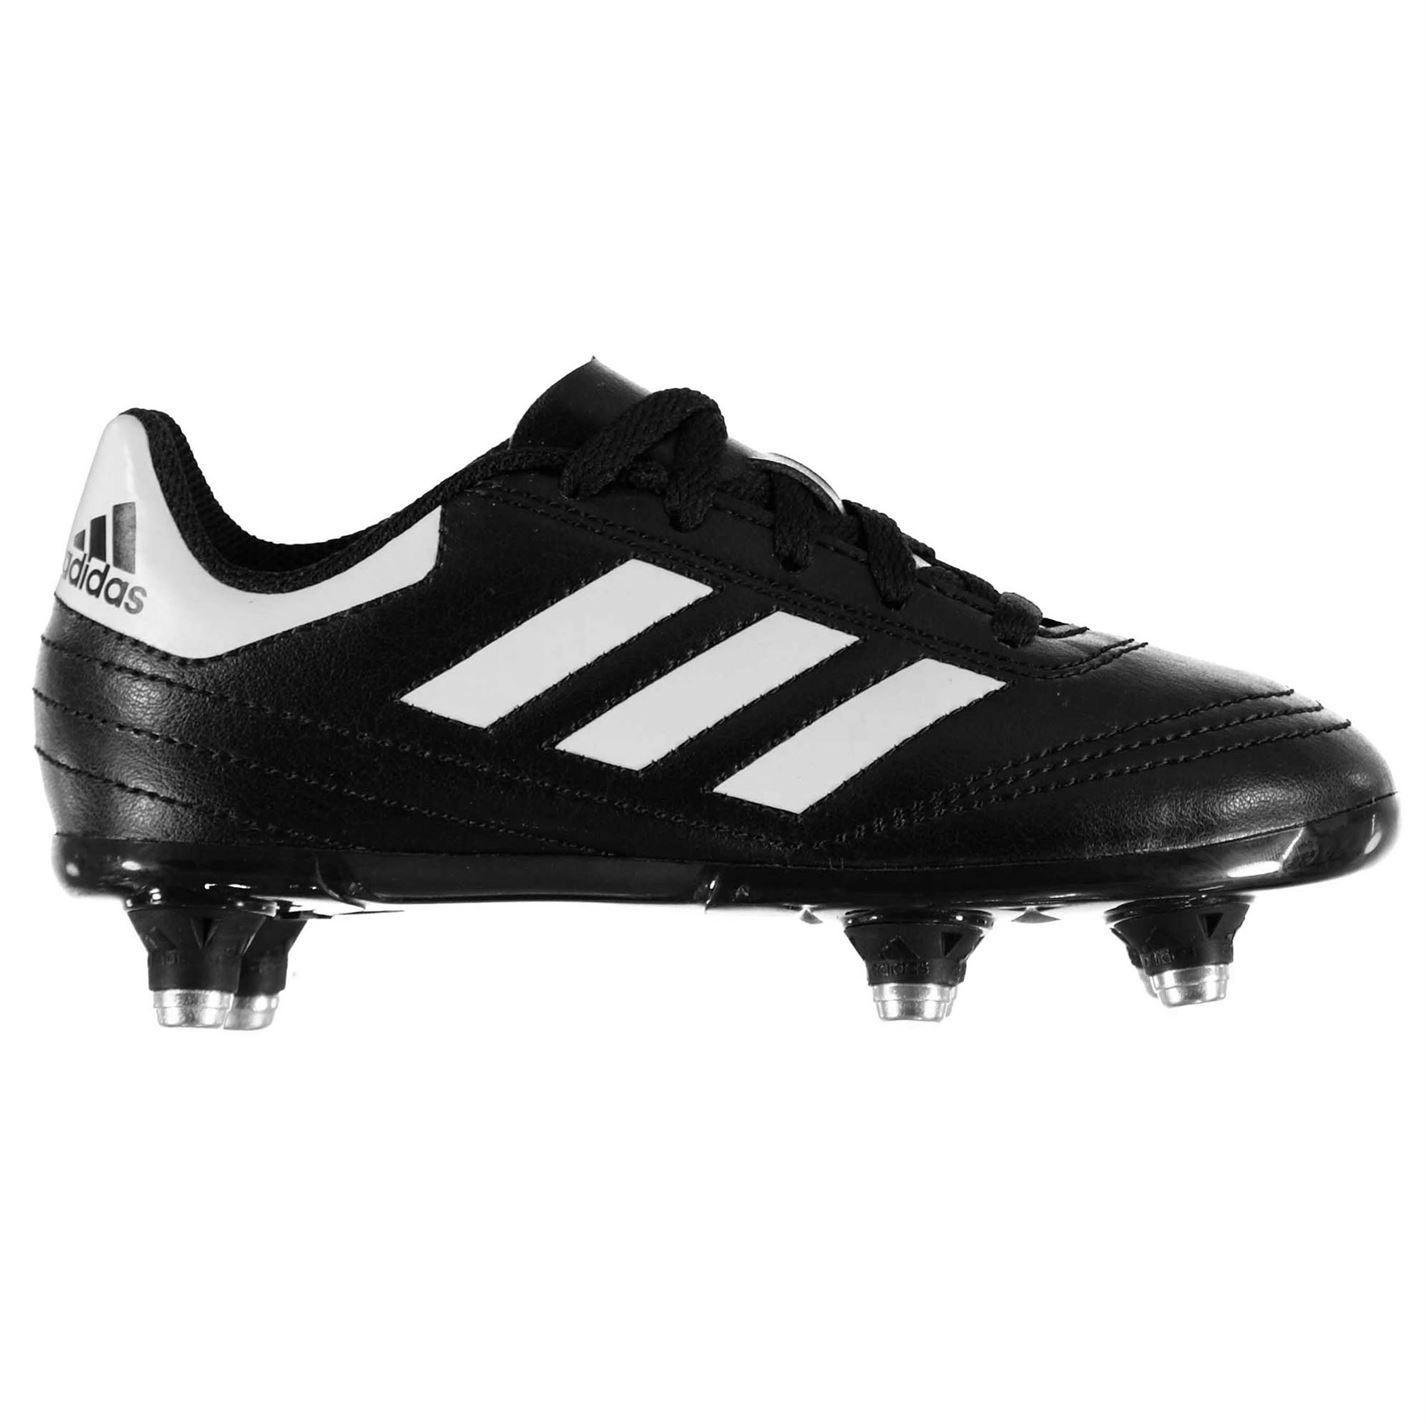 Detské kopačky Adidas Goletto Soft Ground Football Boots Child Boys ... a499d563937